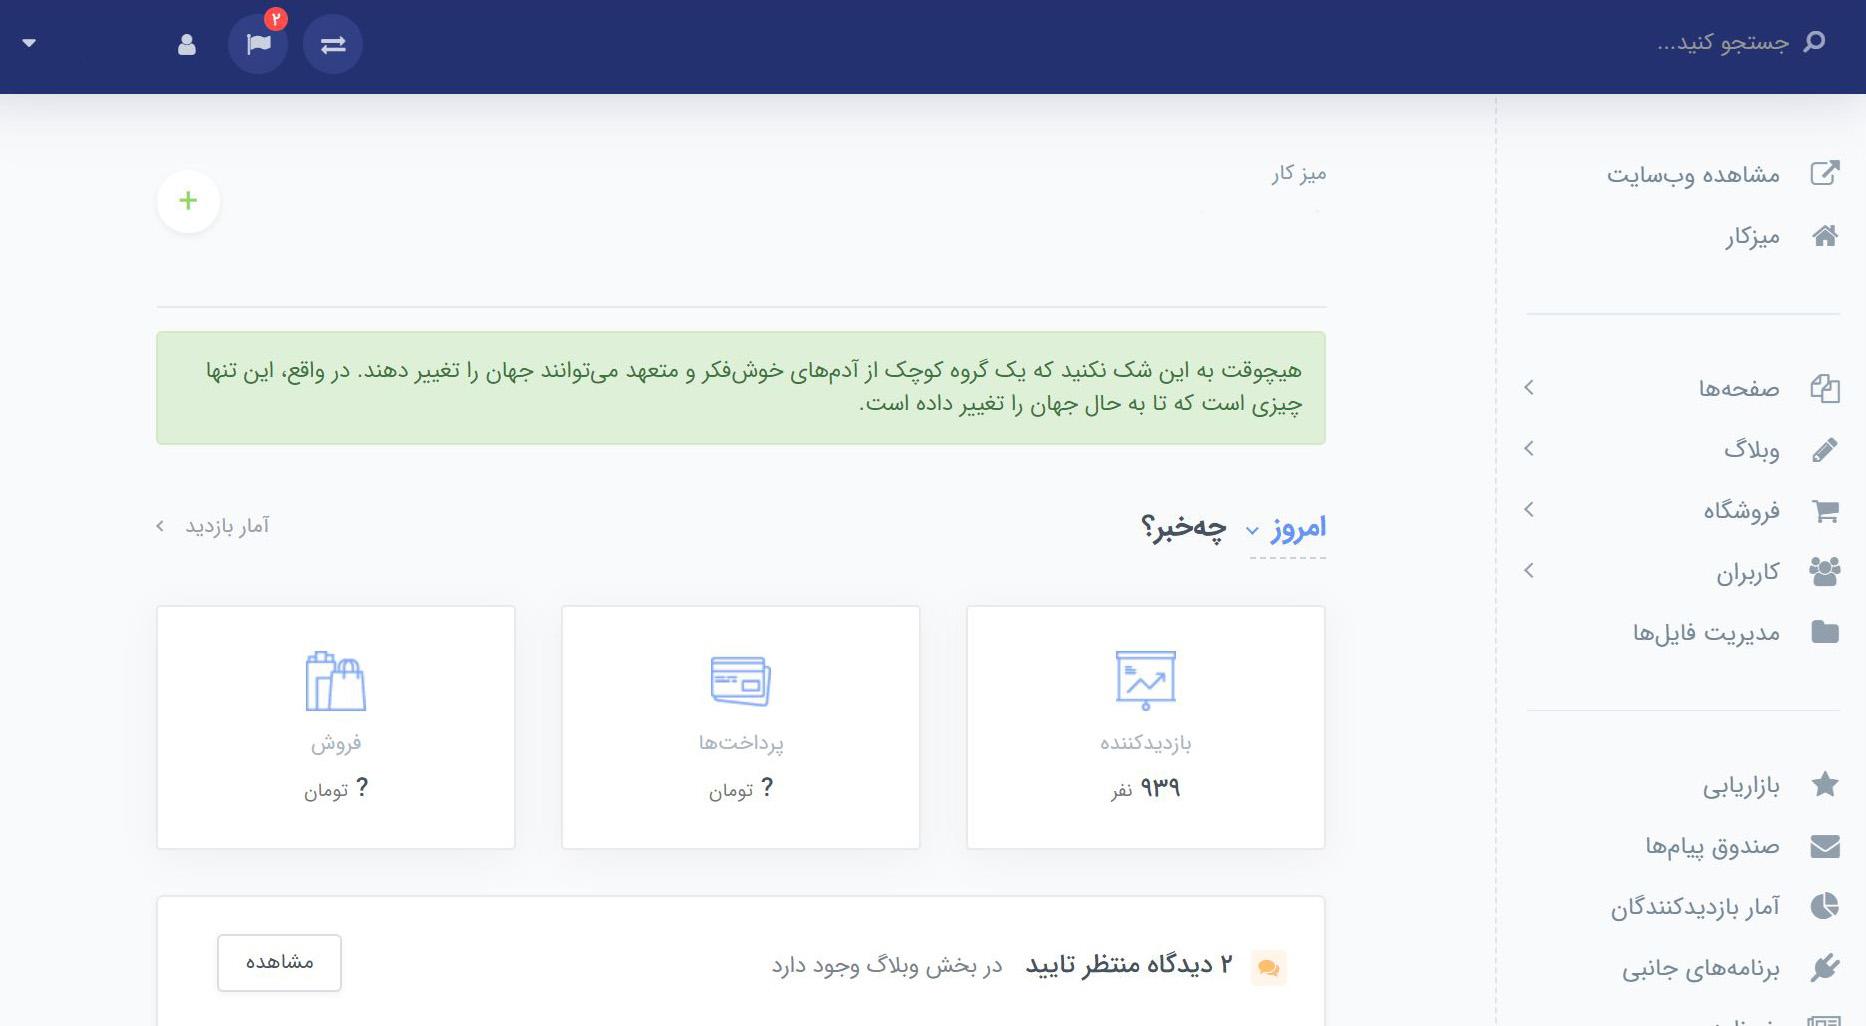 پنل مدیریت سایت ساز پرتال